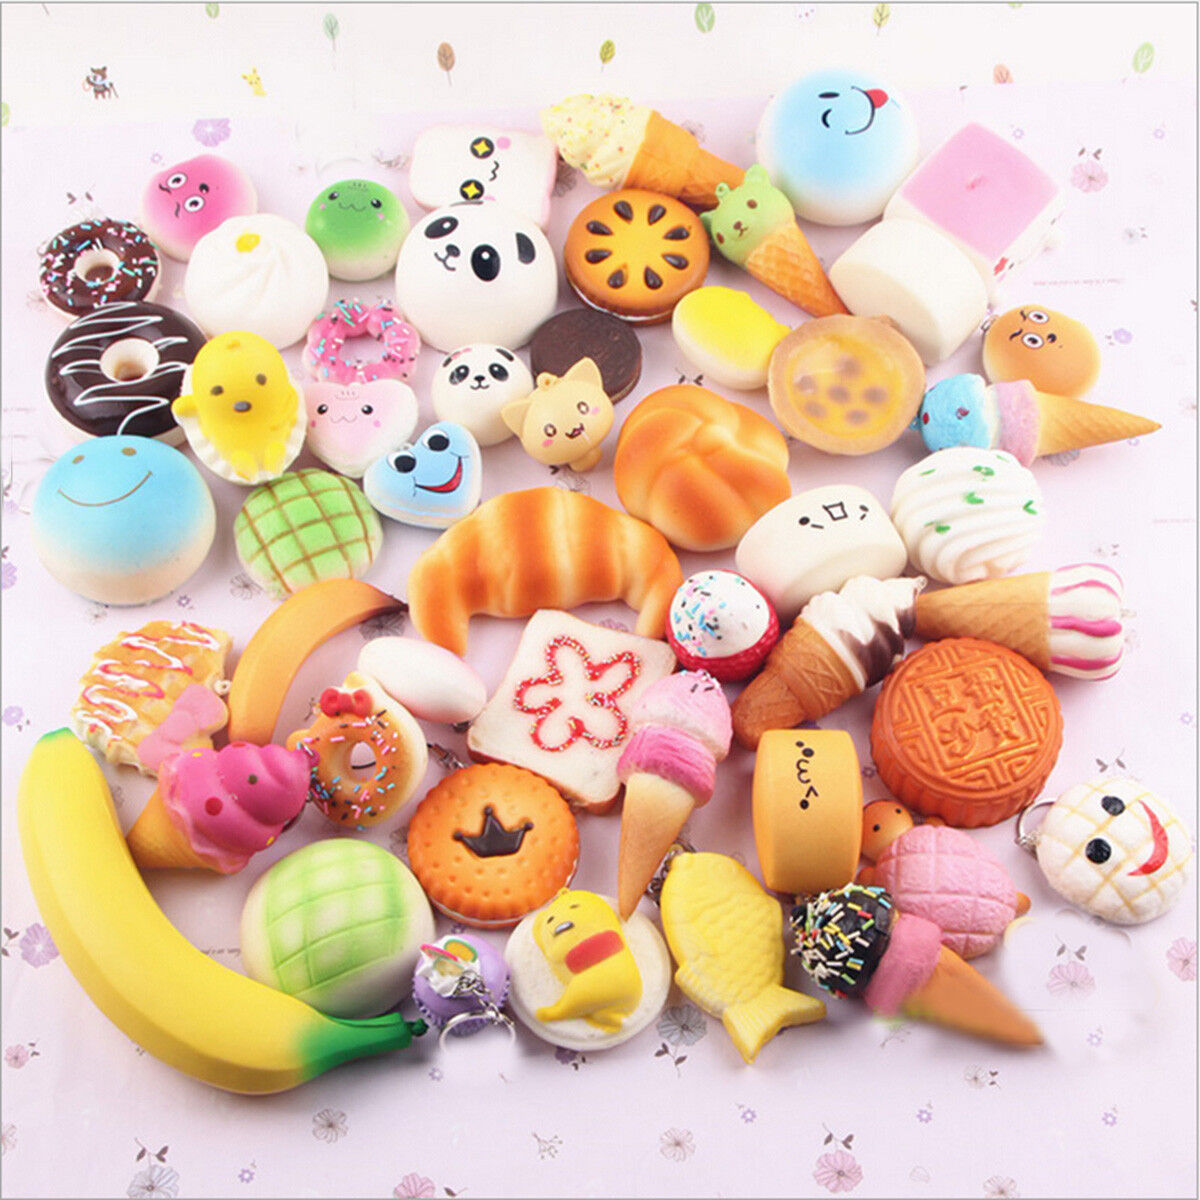 Squishy Mushy Box : 20Pcs Jumbo Medium Mini Random Squishy Soft Panda Bread Cake Buns Phone Straps eBay